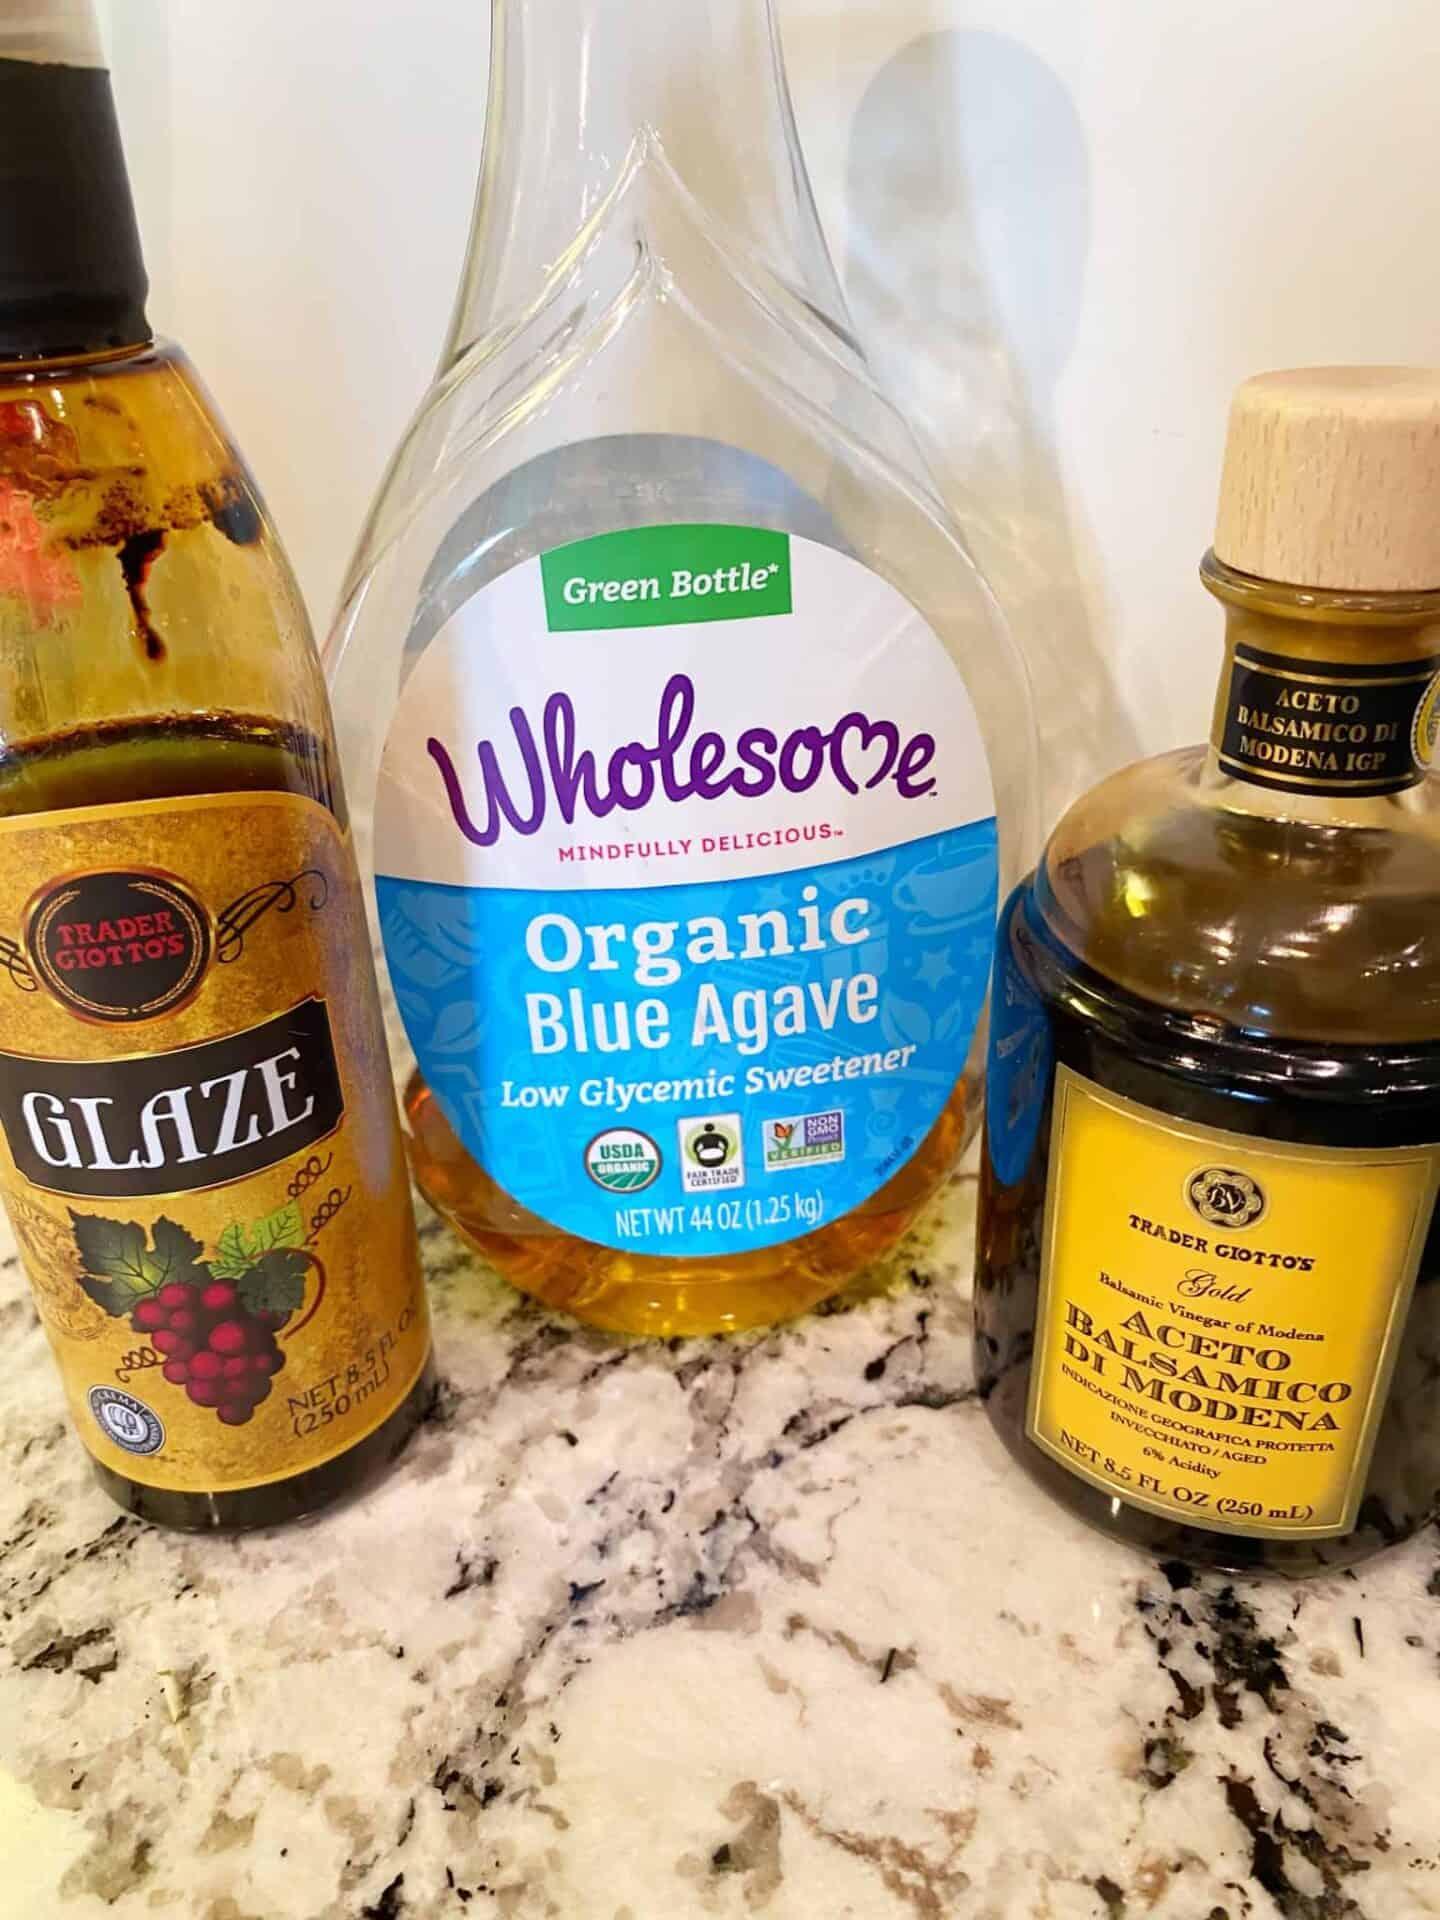 Trader-Joes-Balsamic-Glaze-agave-nectar-Trader-Joes-Balsamic-Vinegar